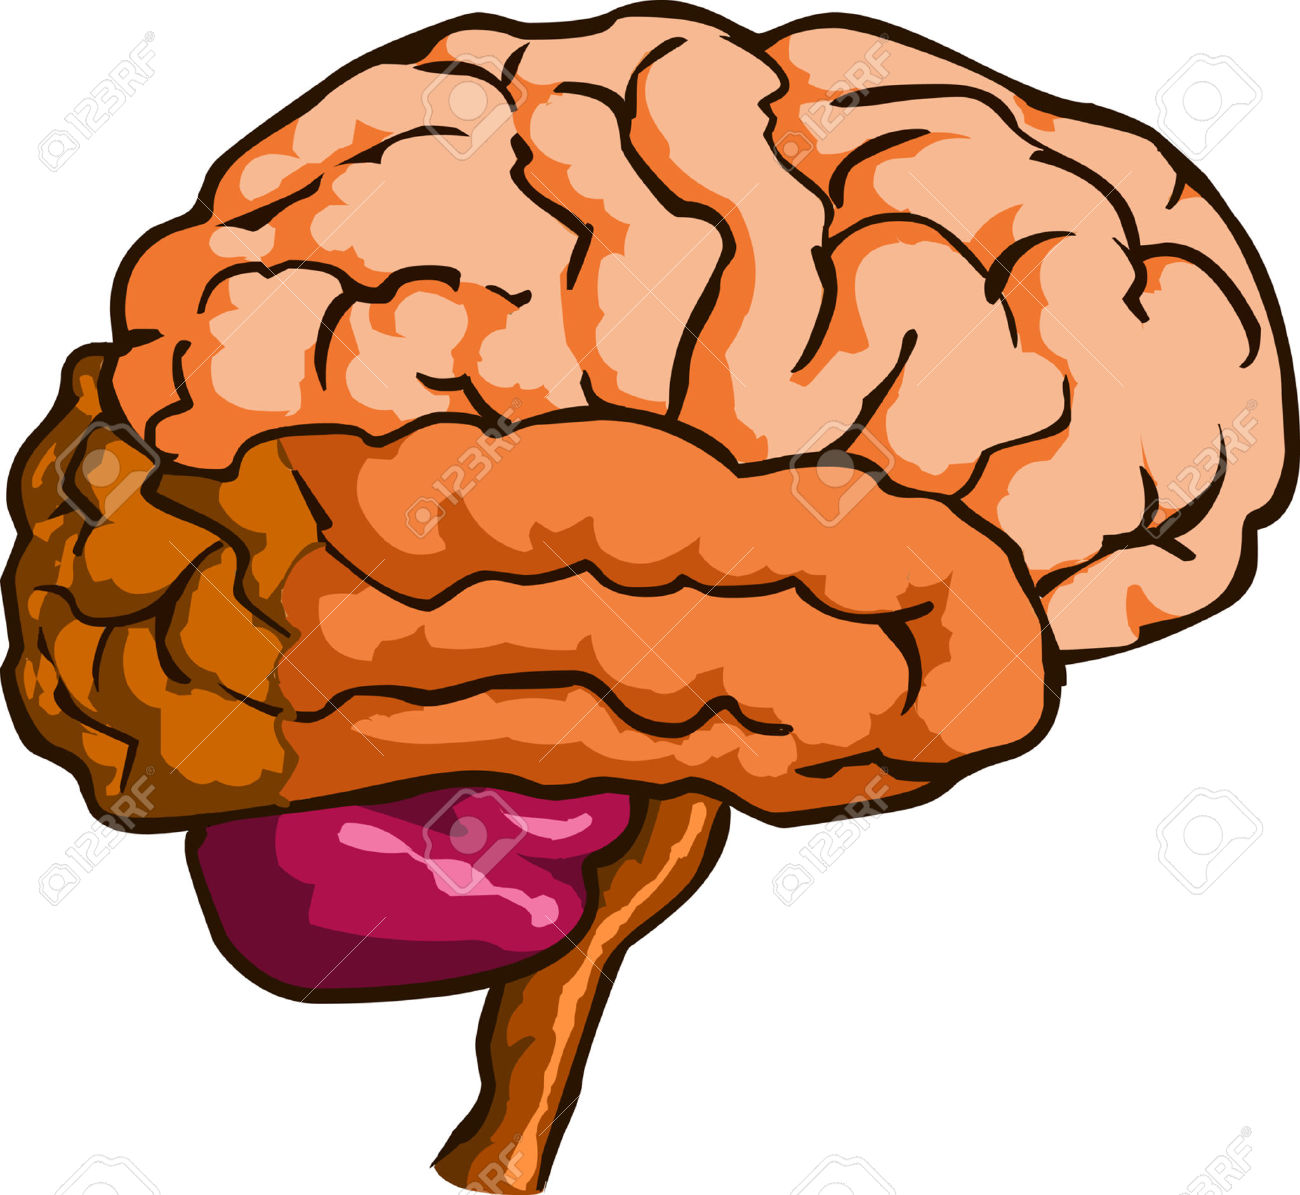 1300x1195 Human Brain Clipart Png